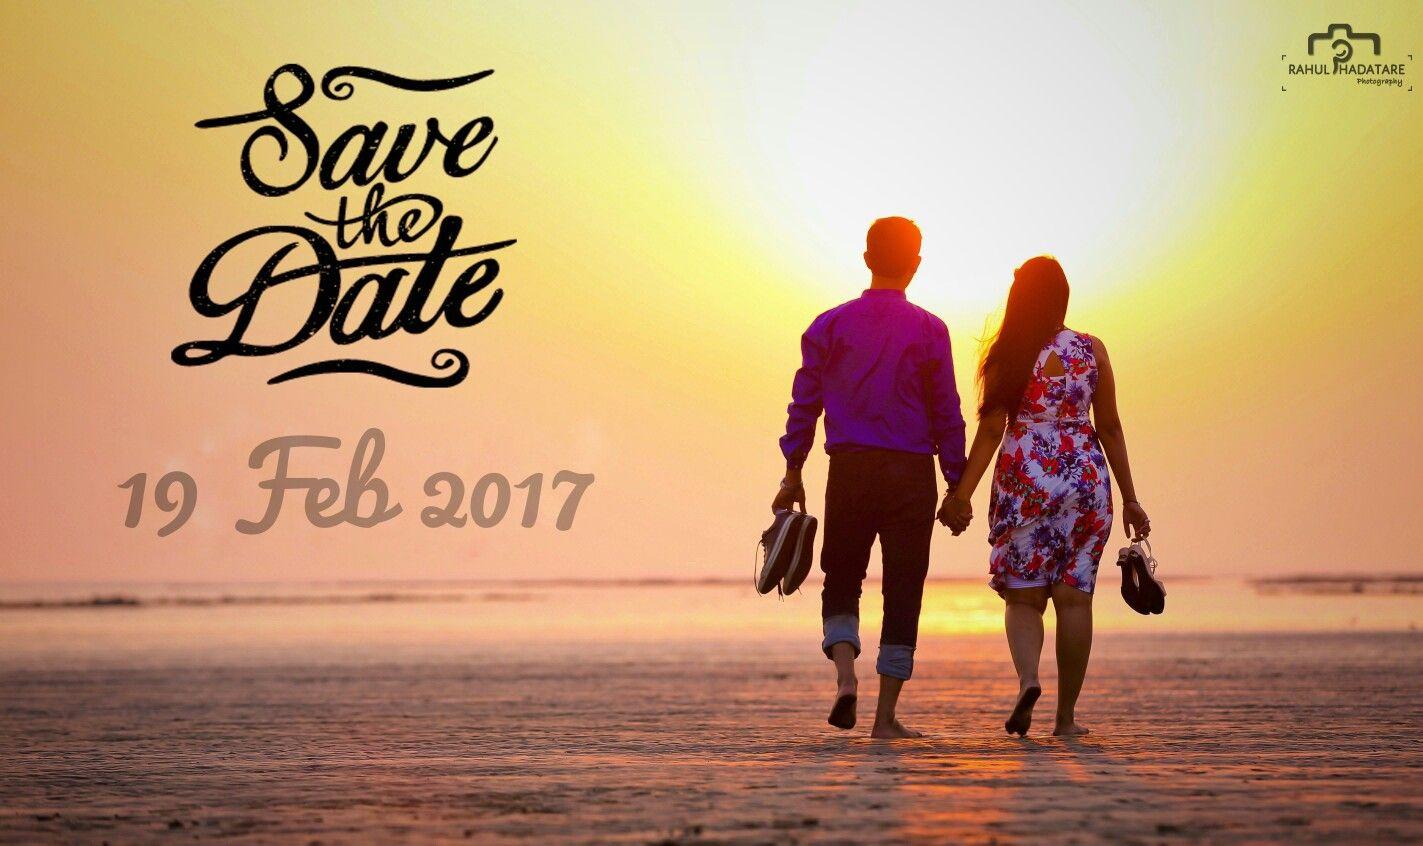 Save The Date Pre Wedding Shoot Couple Love Hug Sunset Beach With